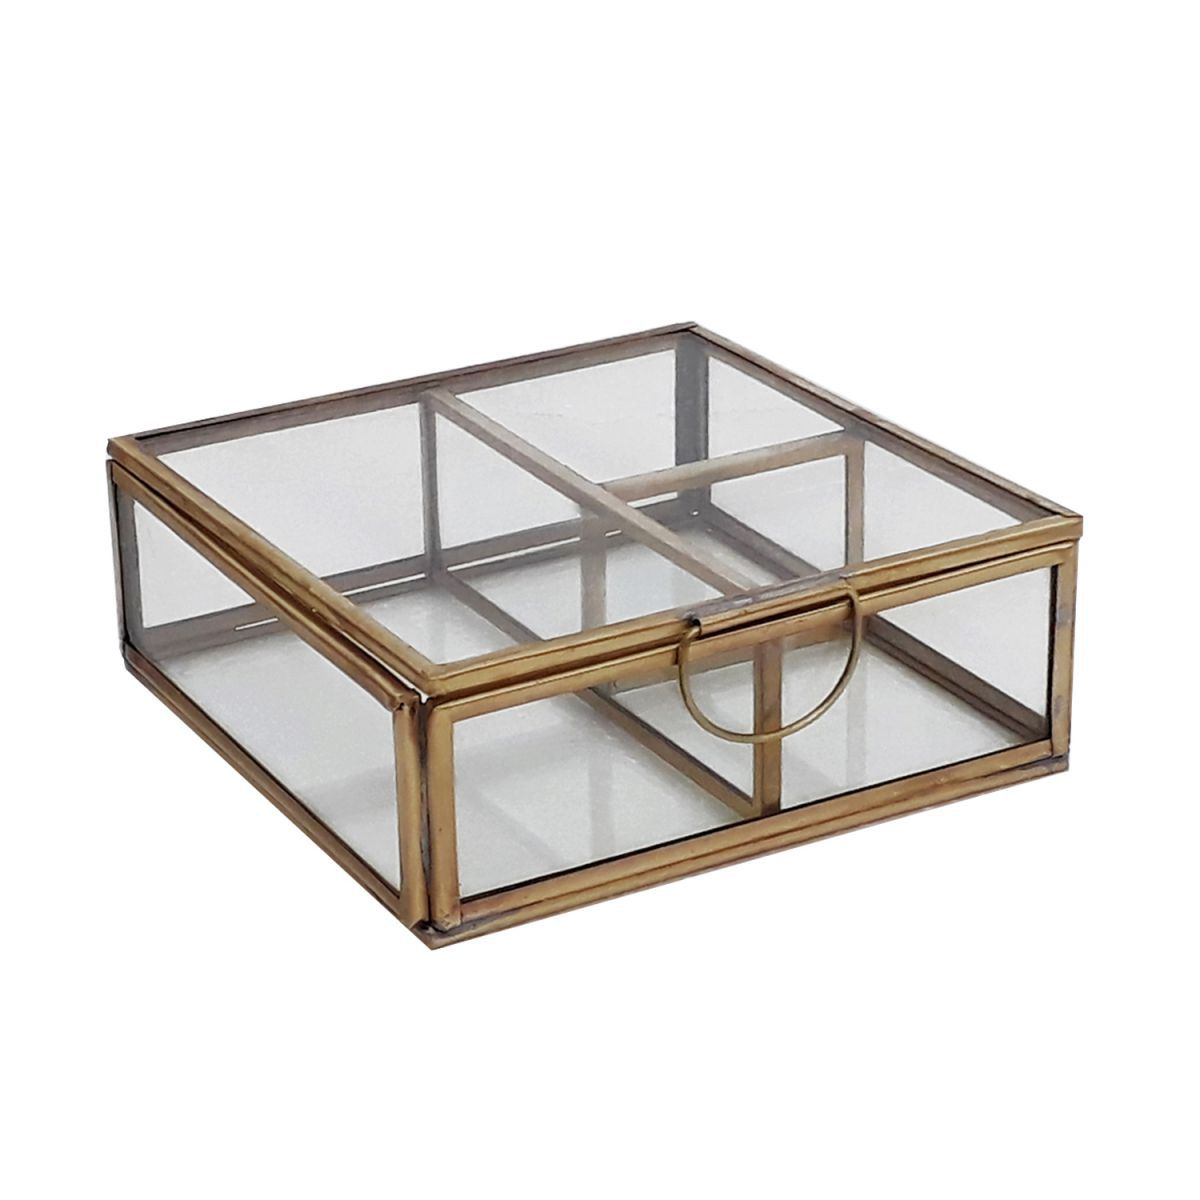 rocaflordisplaybox met vakken vierkant glas messing 13x13x45cm